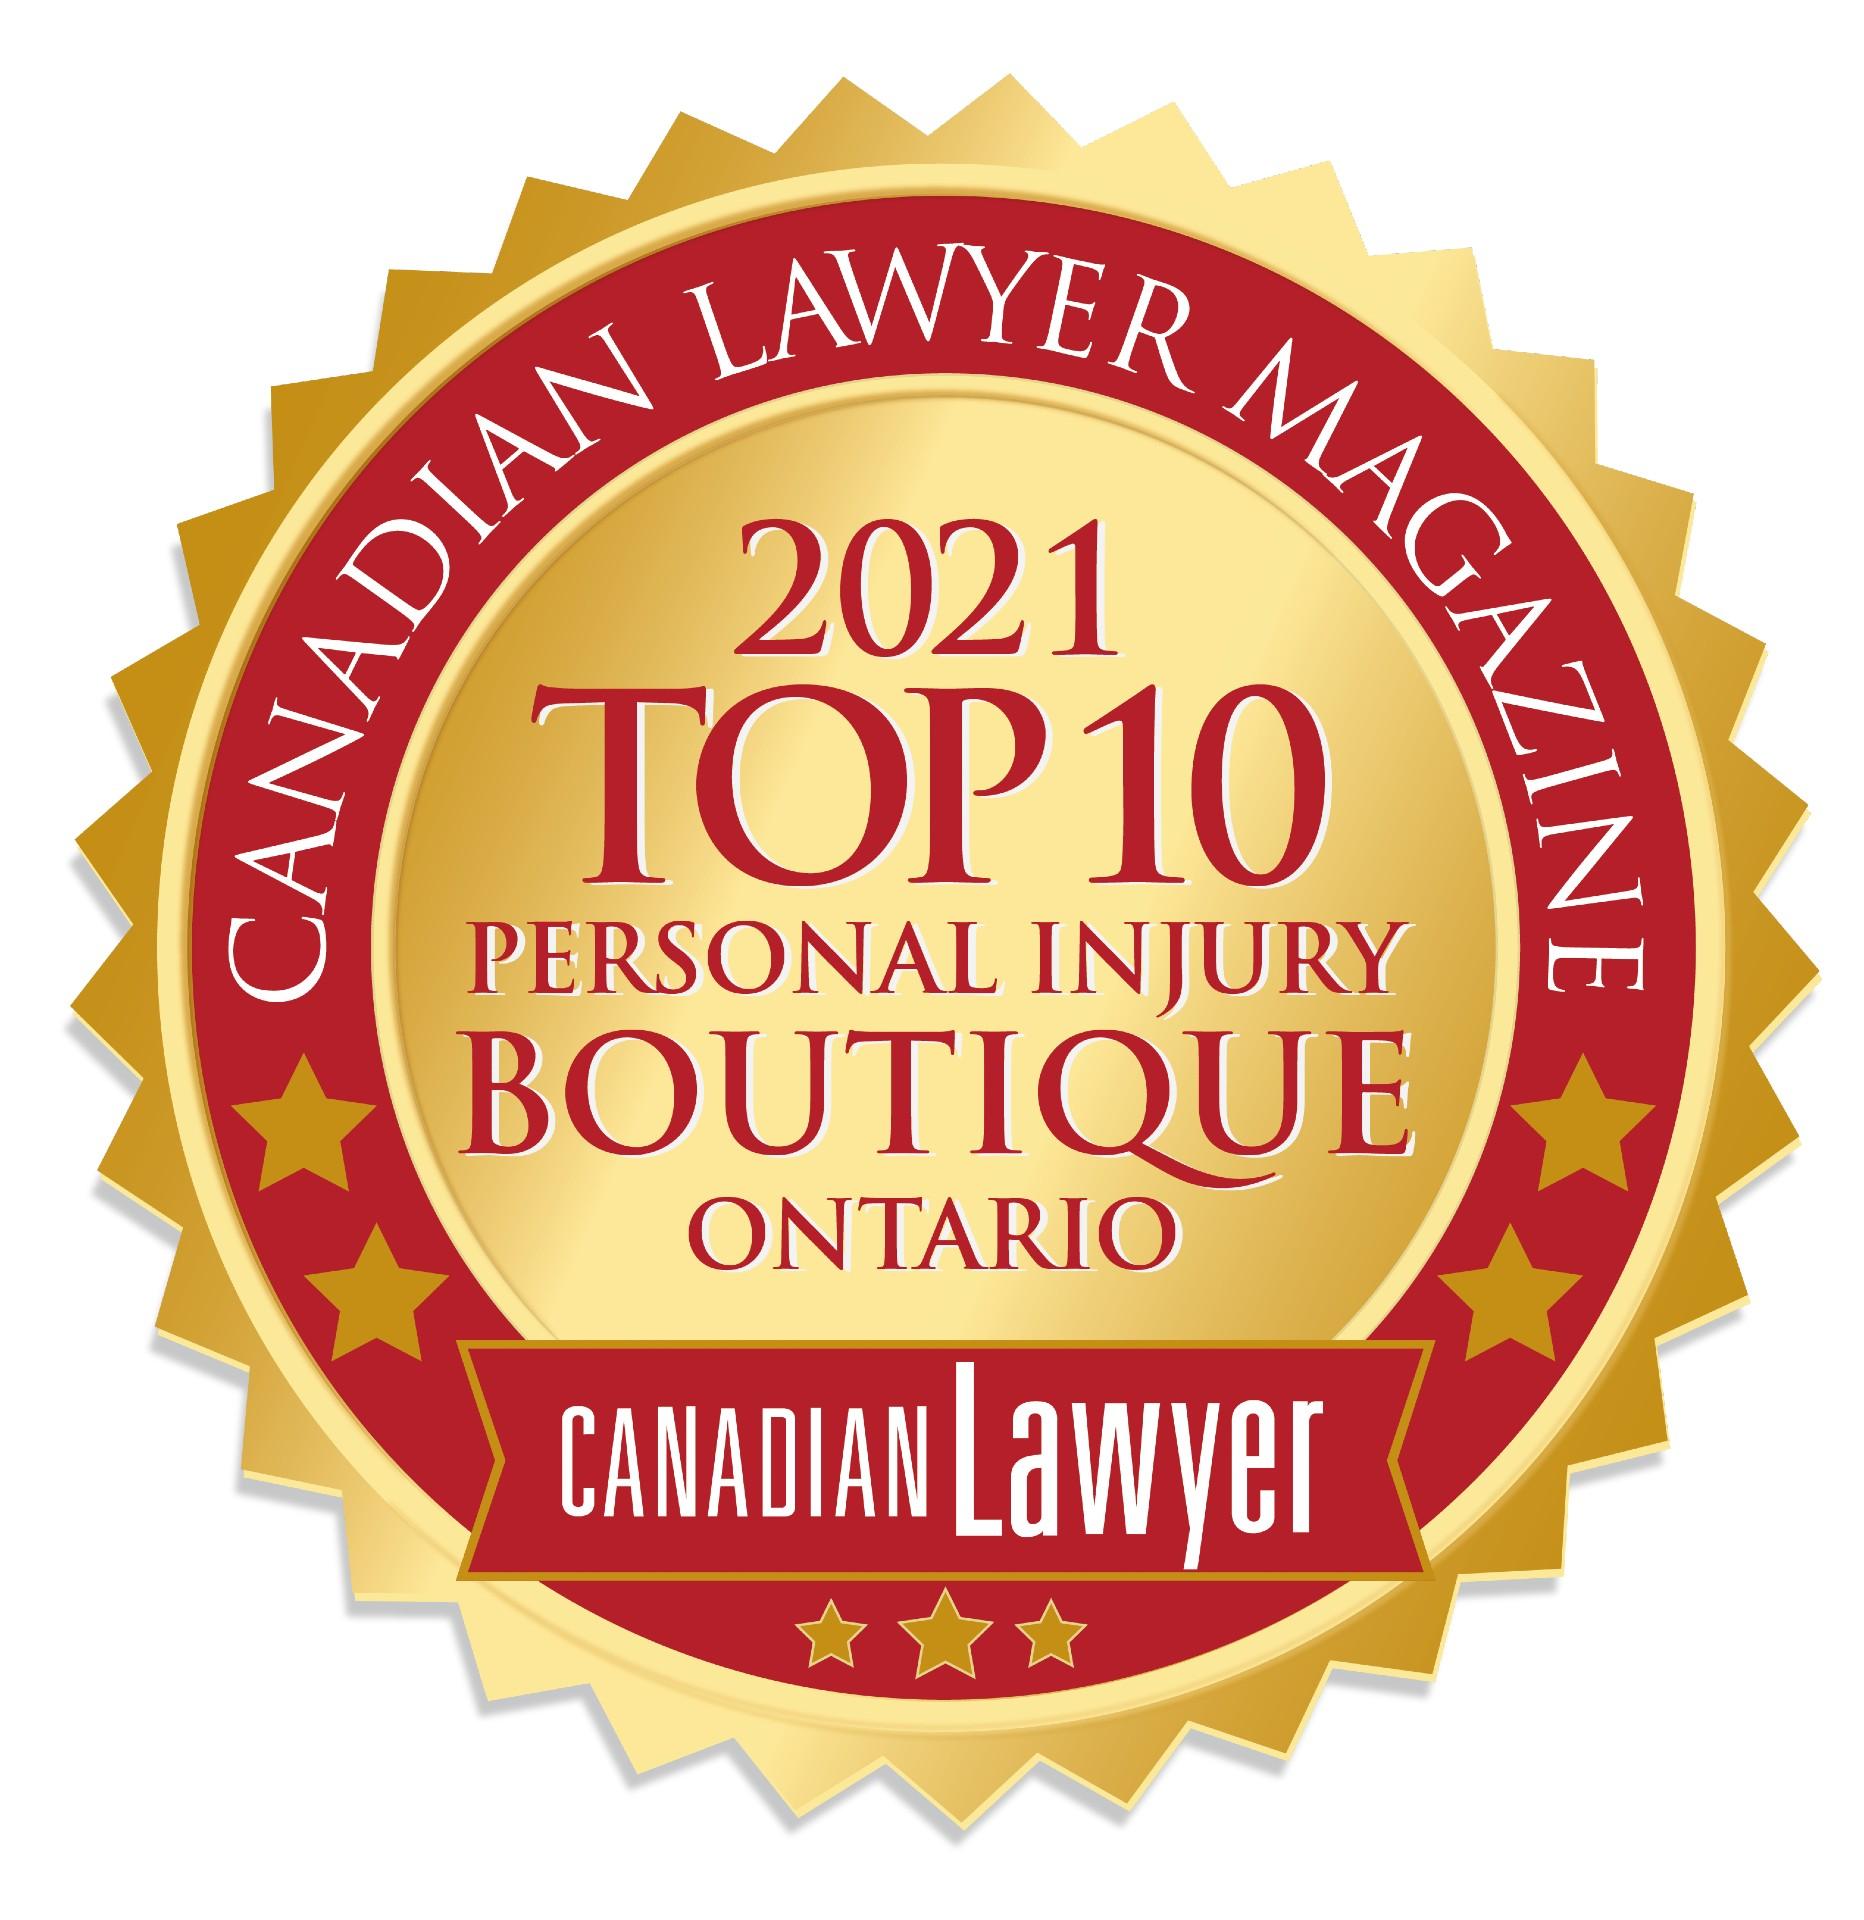 medical malpractice lawyers, canadian lawyer top 10